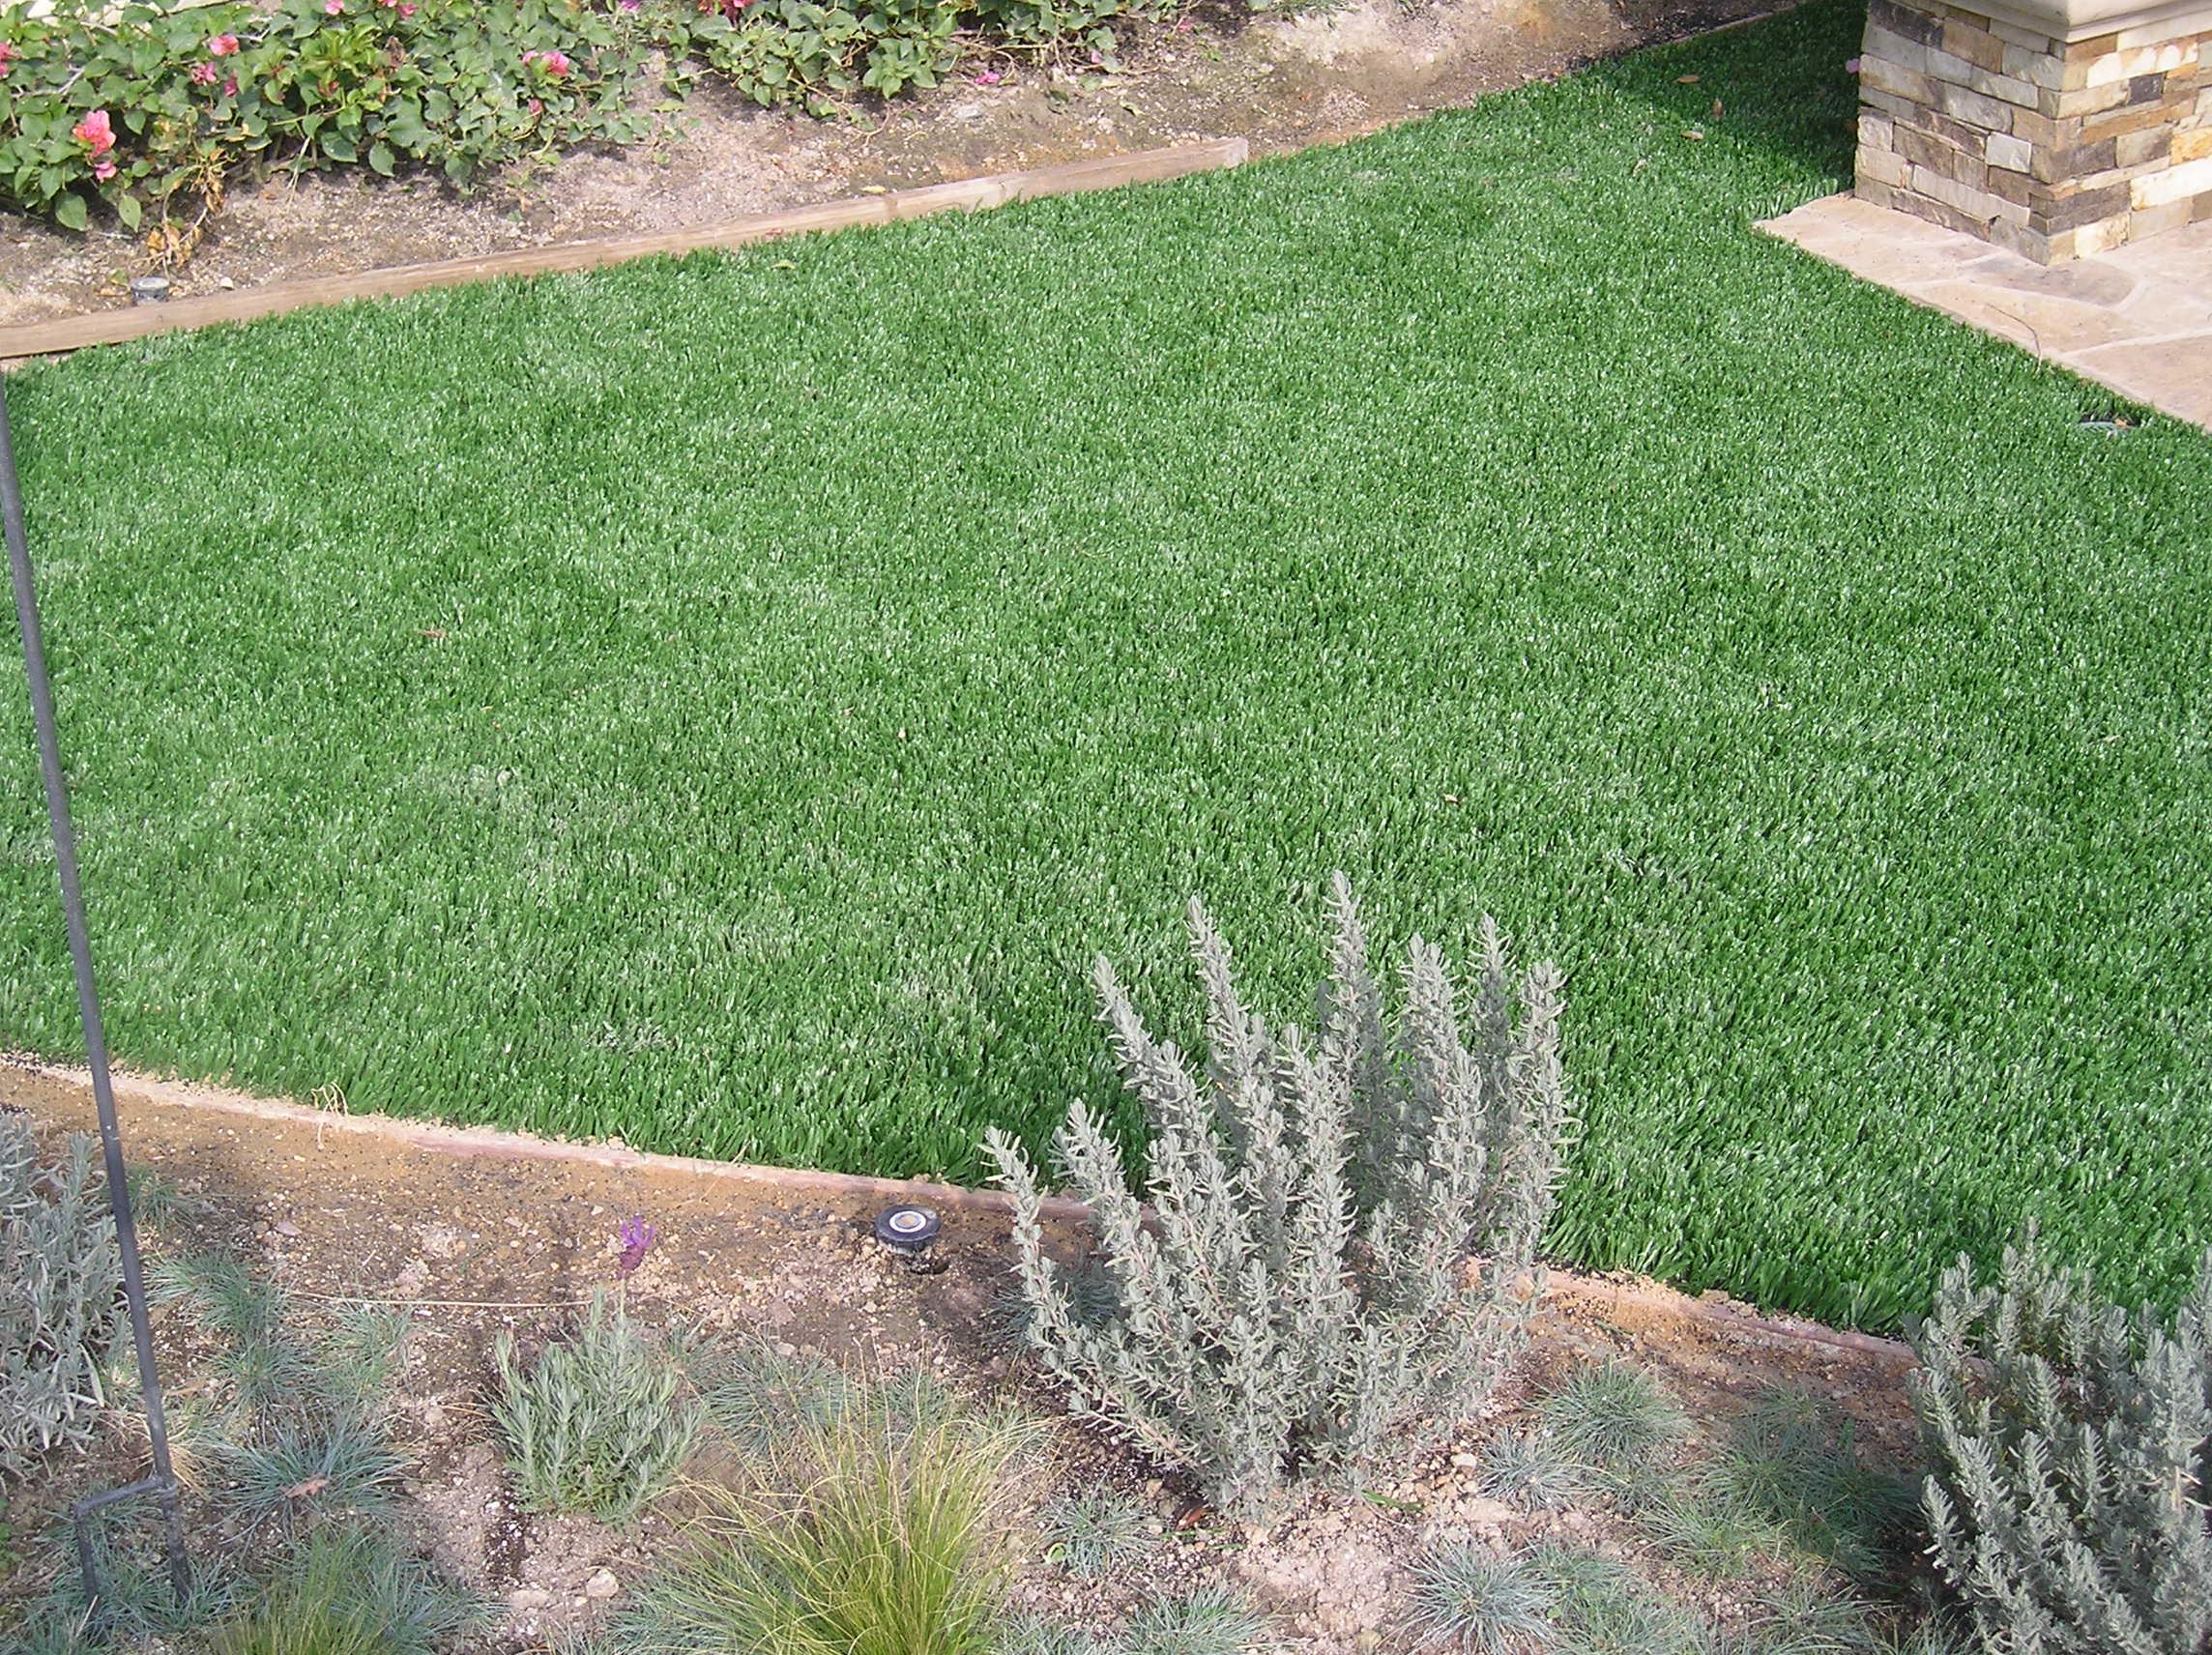 Olive-51 fake grass for yard,backyard turf,turf backyard,turf yard,fake grass for backyard